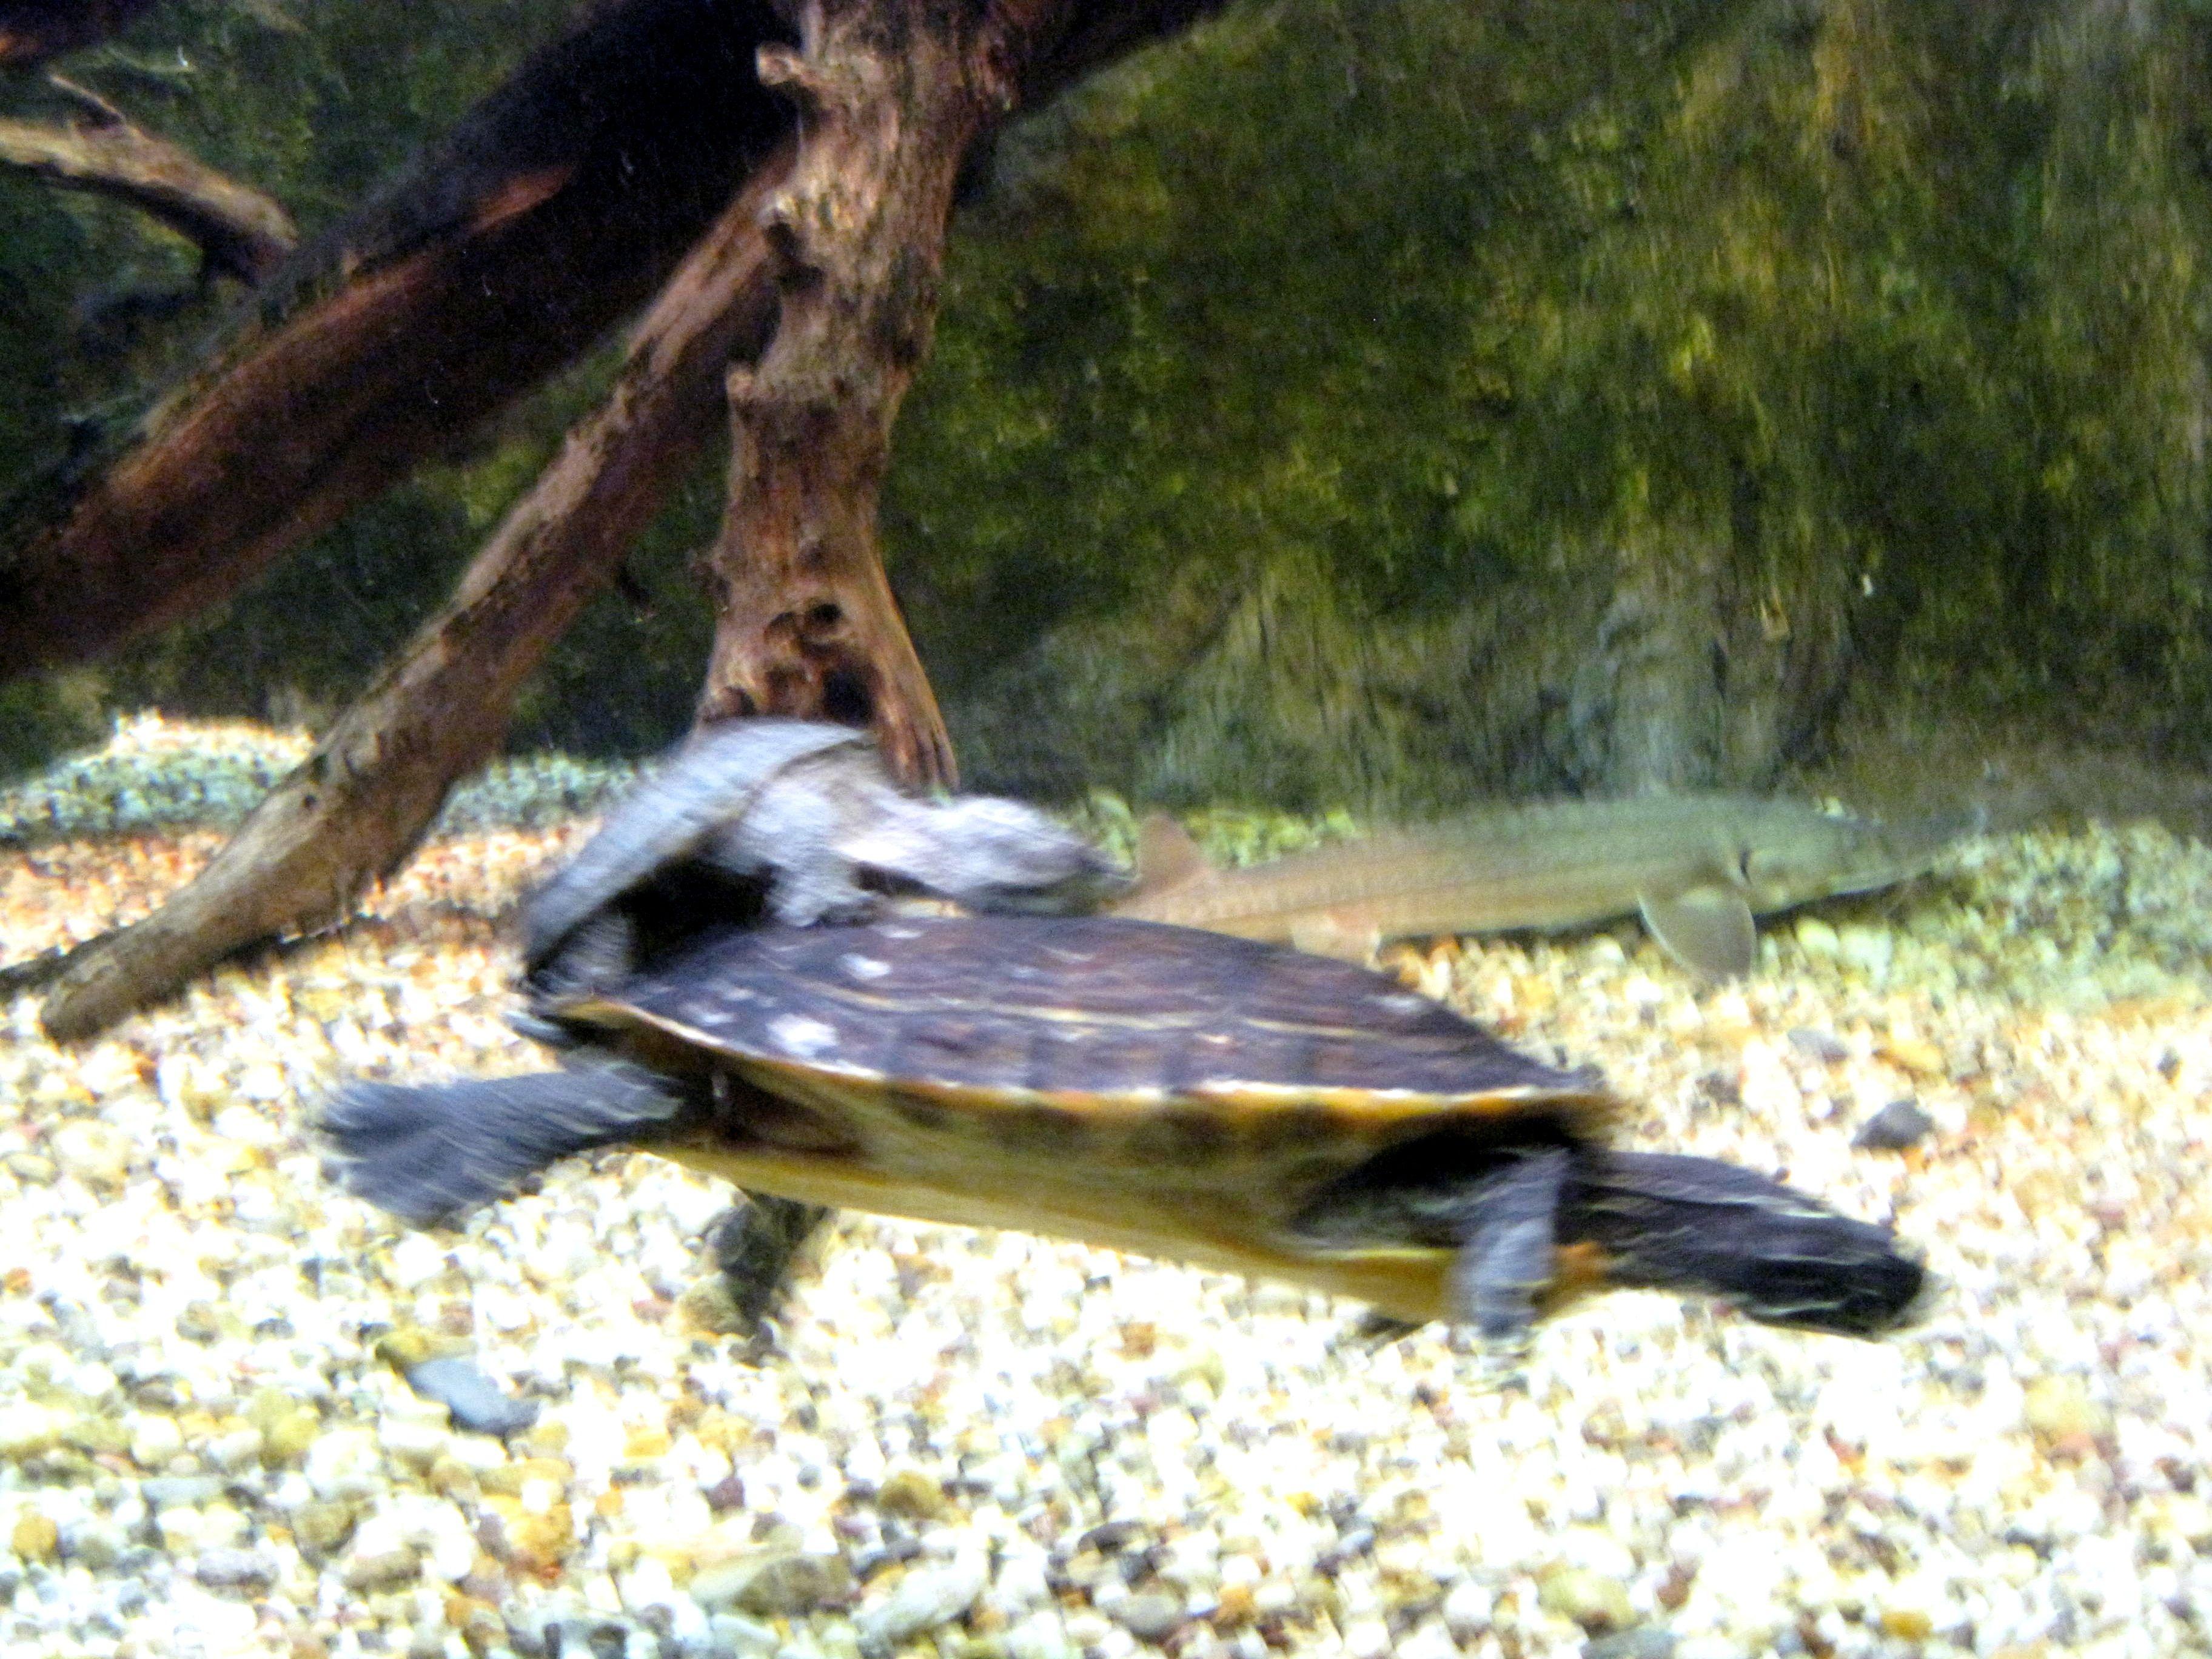 Piggy backing at the DC aquarium RAM s Animal Friends